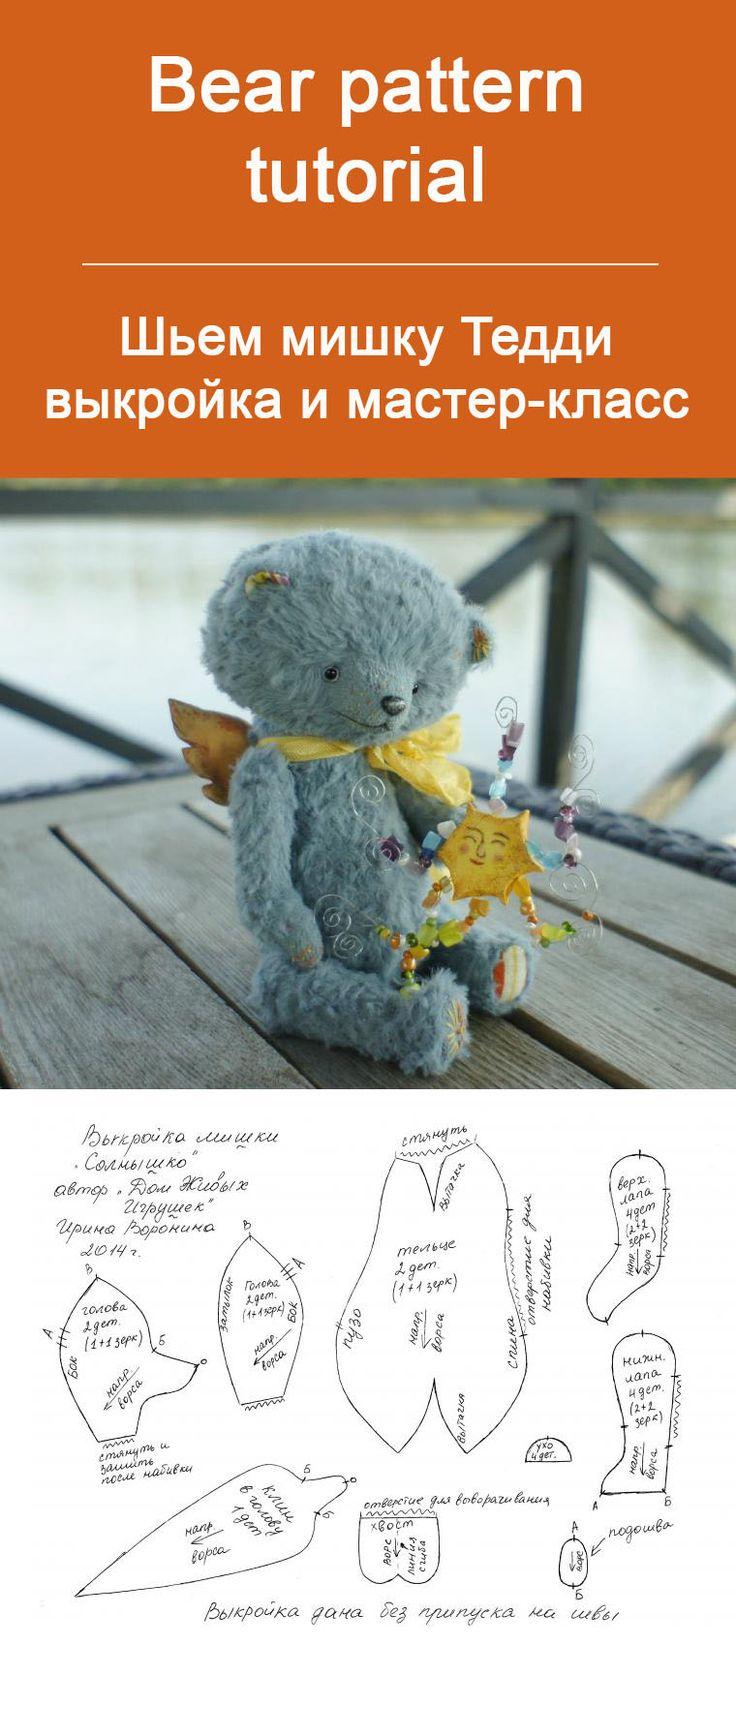 Мишка Тедди - выкройка и мастер-класс / Teddy-bear pattern tutorial #teddy #toy…